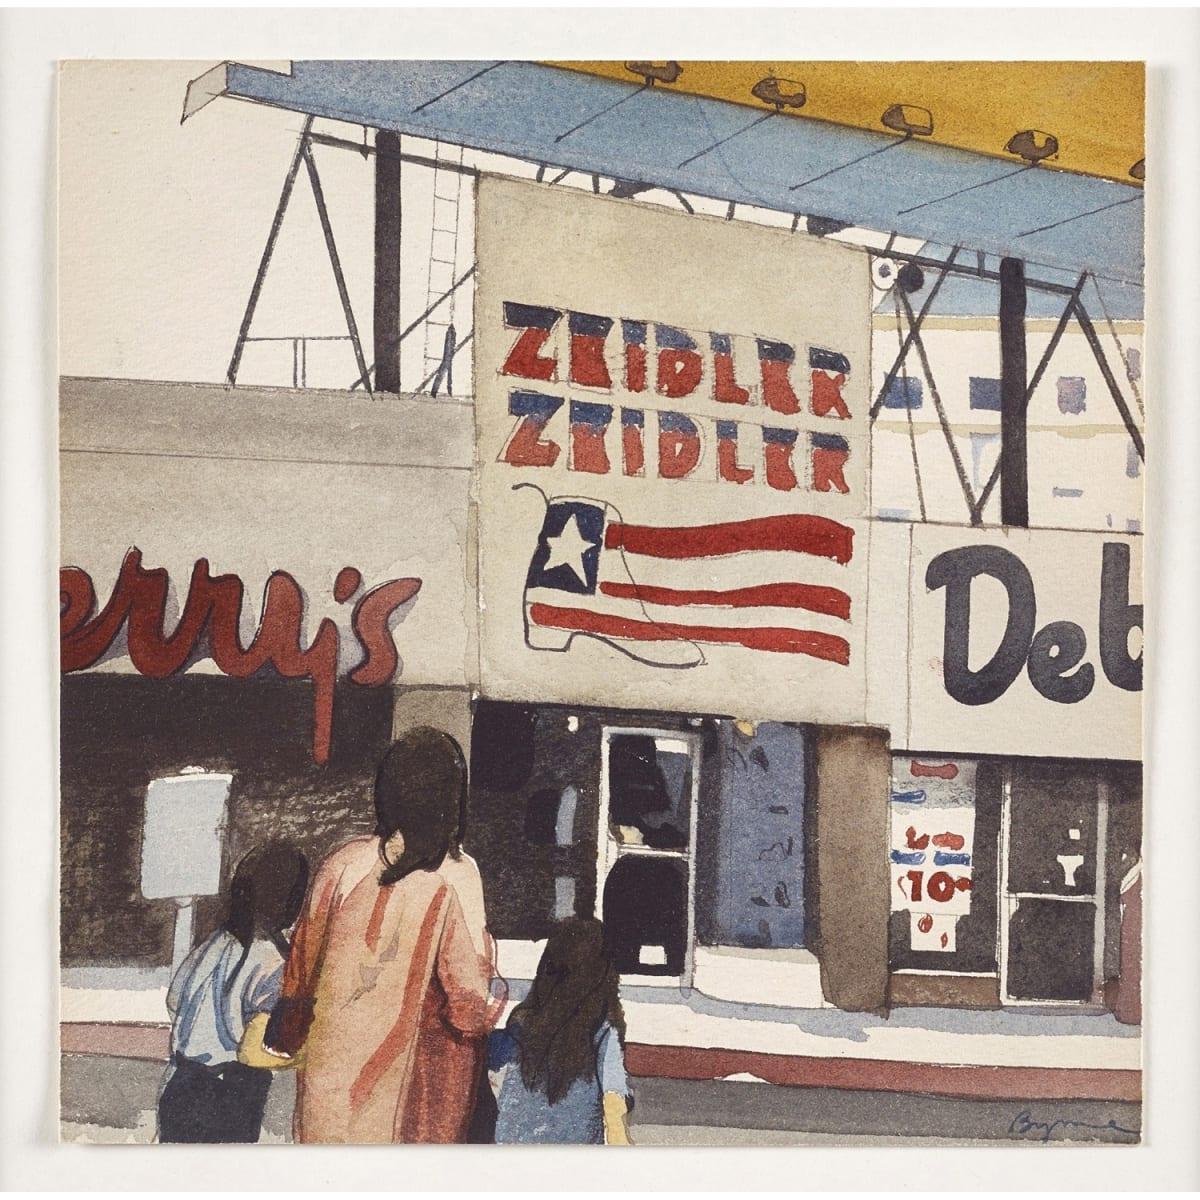 John Byrne Zeidler & Zeidler signed watercolour 6 3/4 x 6 3/4 inches